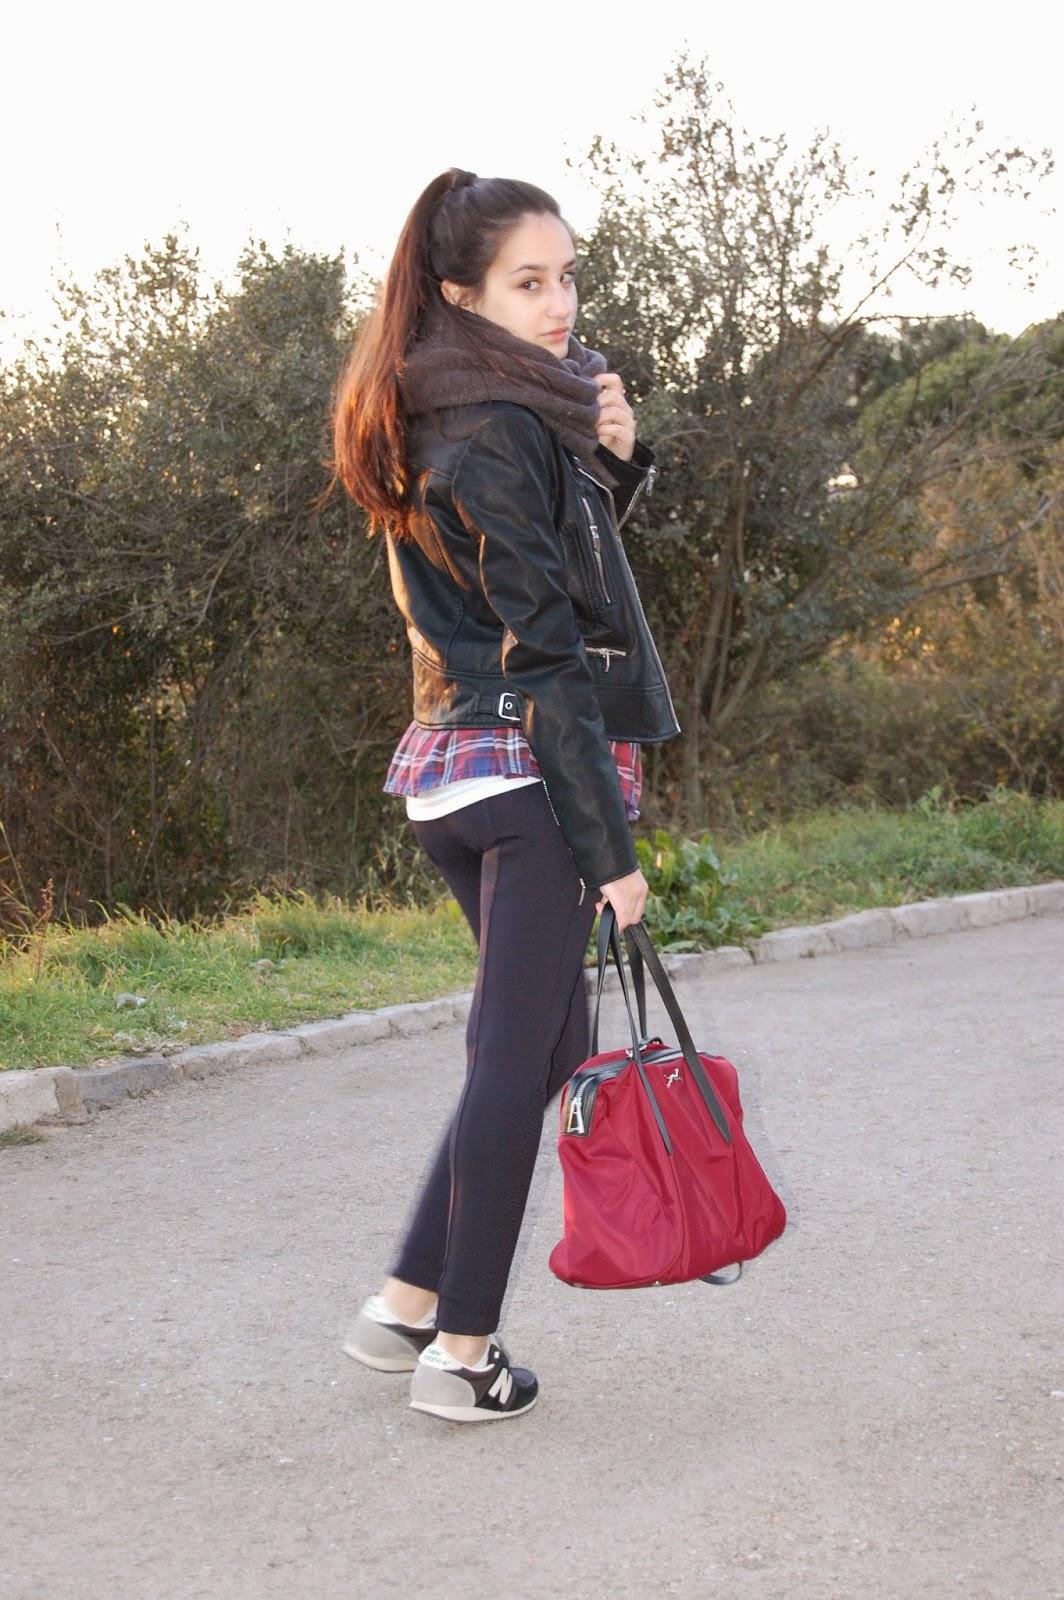 cazadora negra zara, bufanda gris zara, camisa quadros mango, leggins azul marino zara, zapatos negros new balance, bolso bimbaylola